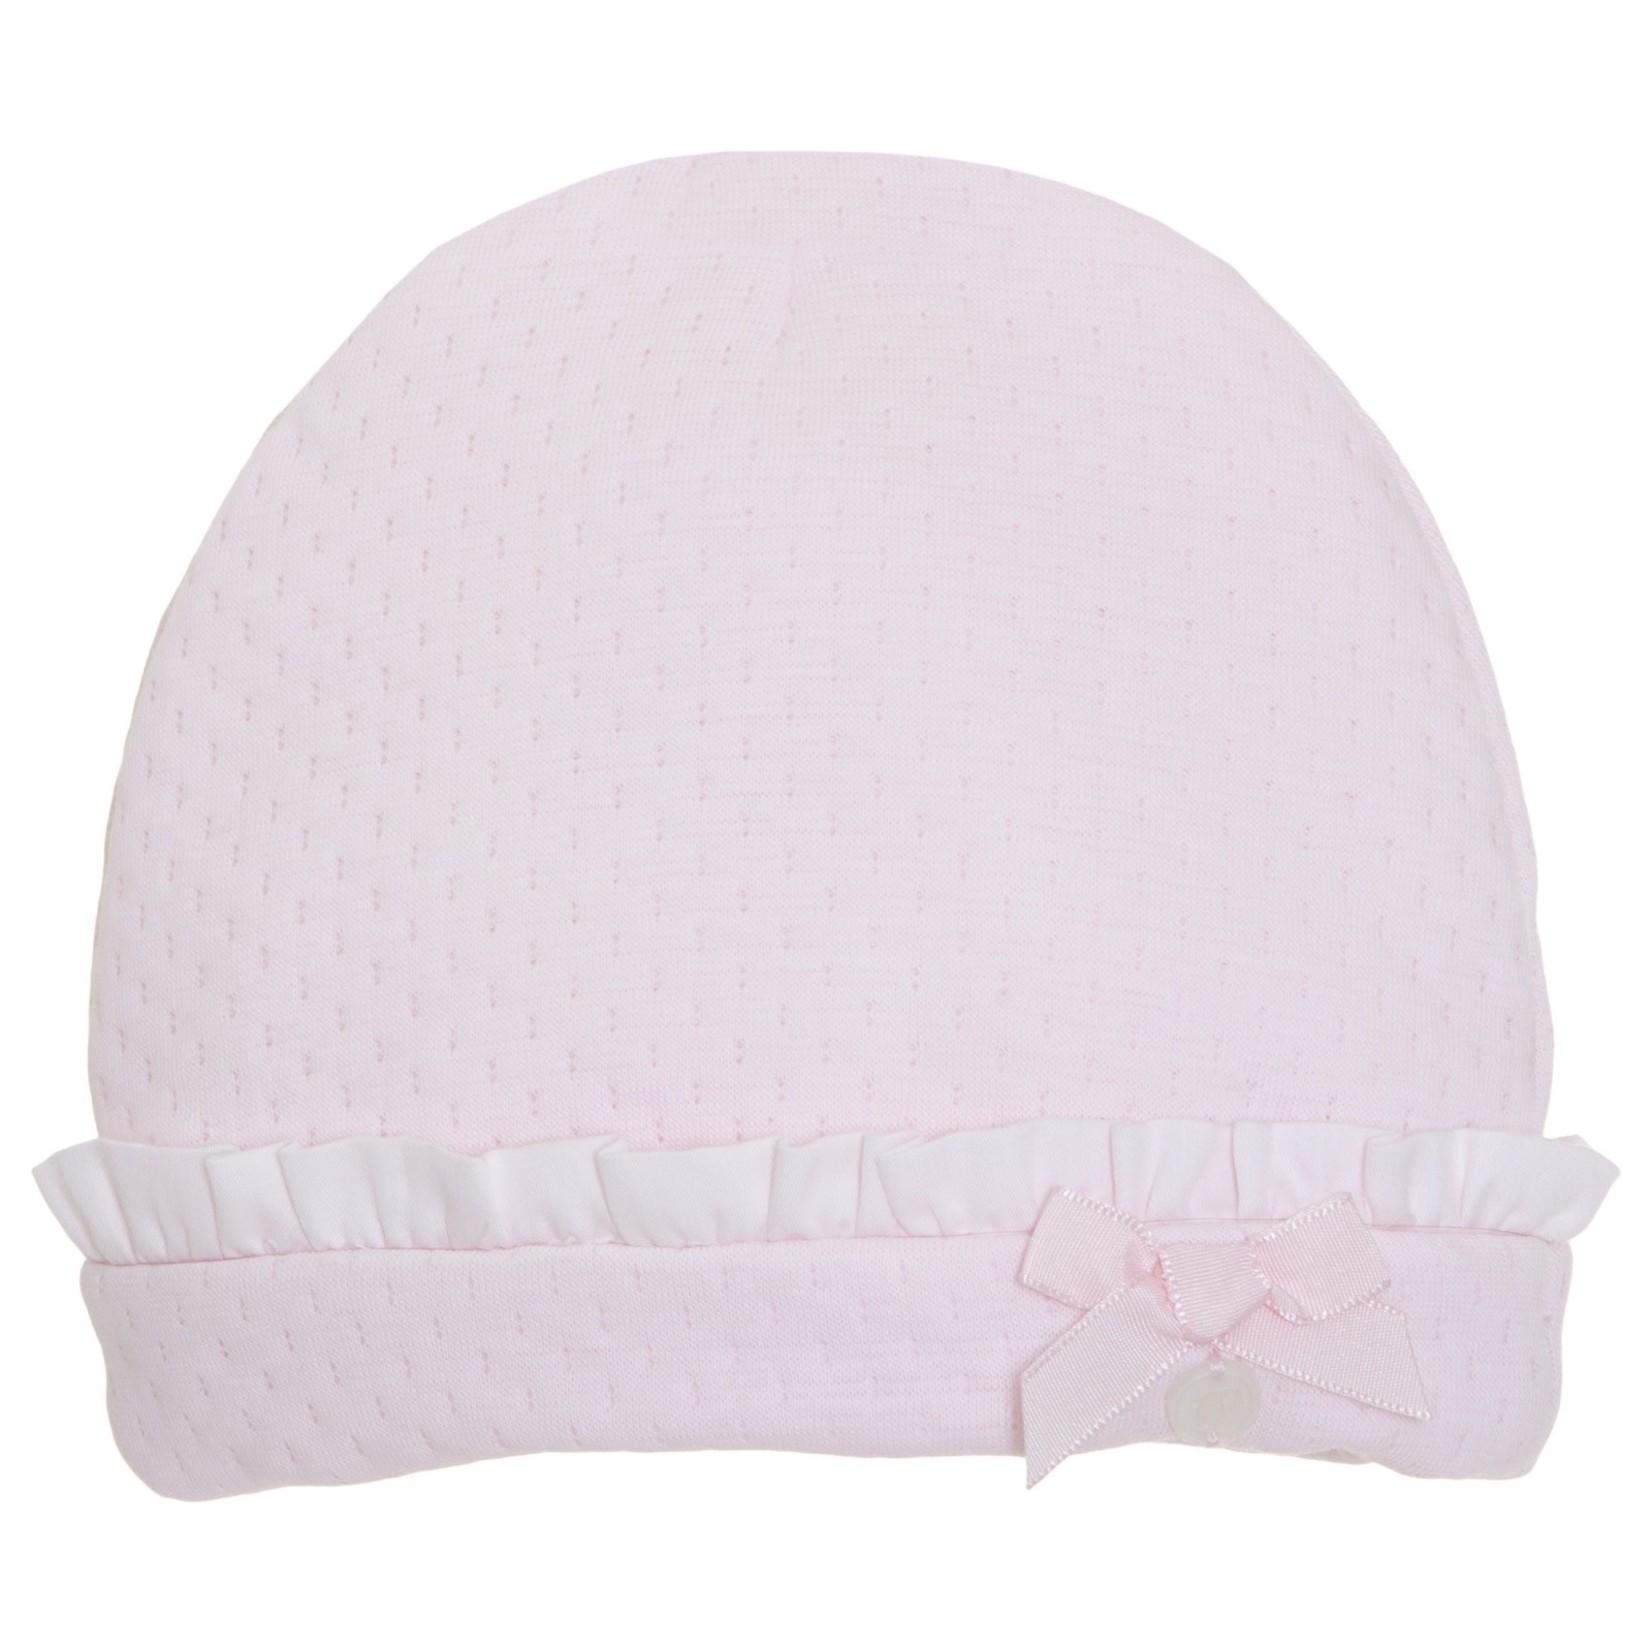 Newborn Hat Ruffle - Patachou